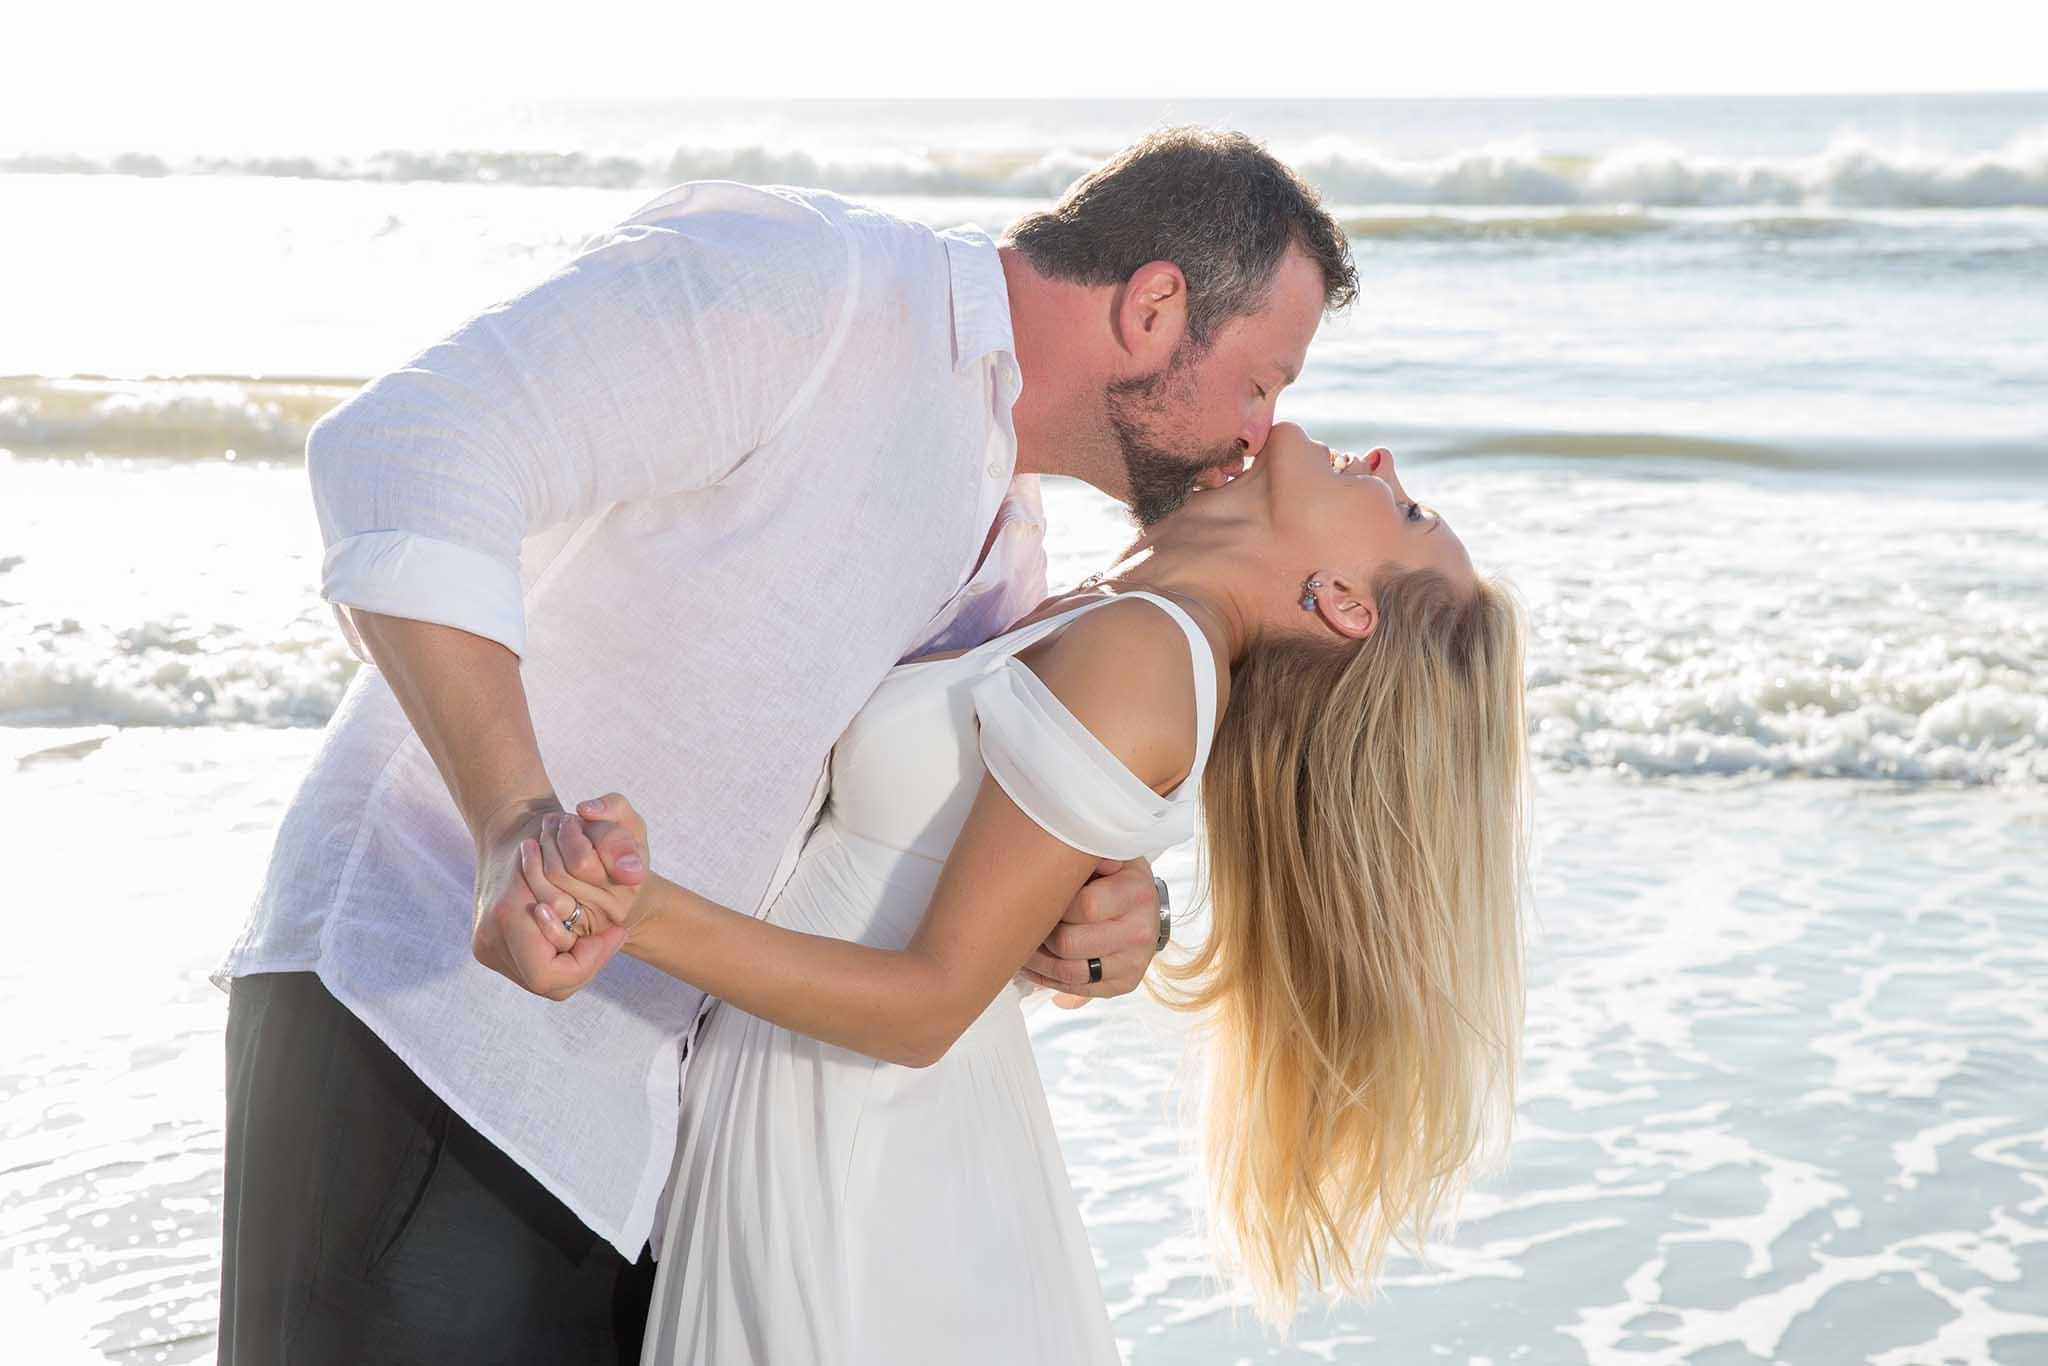 groom is kissing the bride